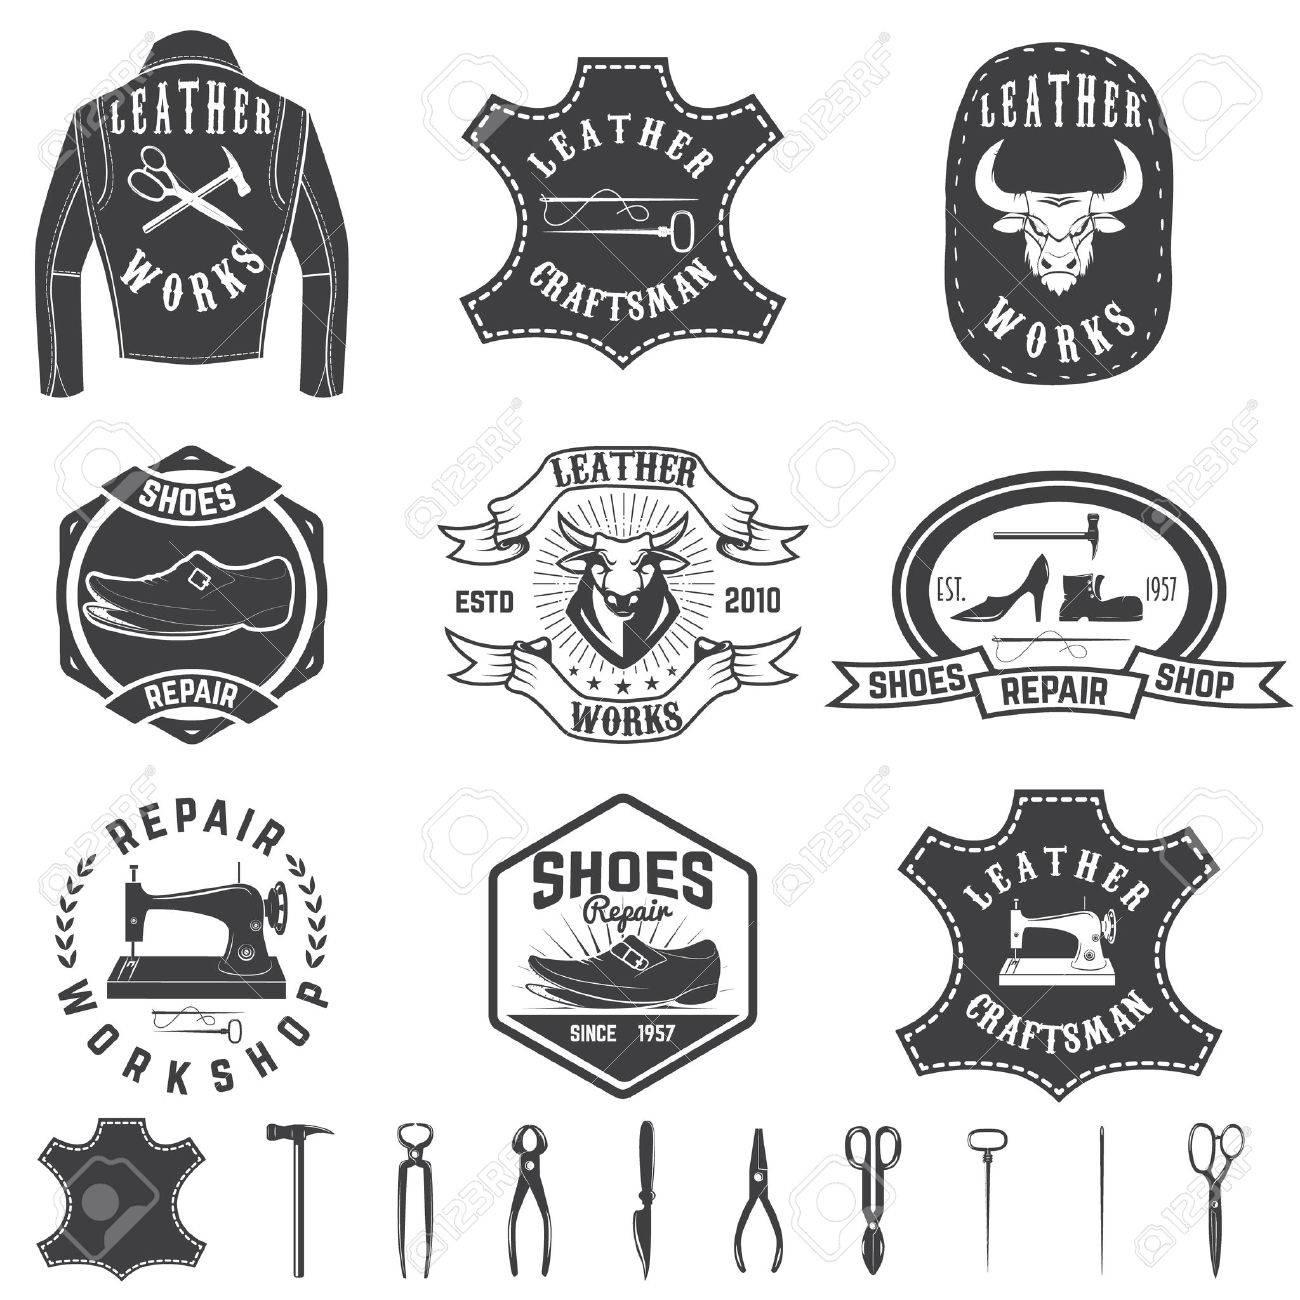 Set of repair workshop labels and design elements. Leather works, shoe repair, apparel workshop. - 62781110